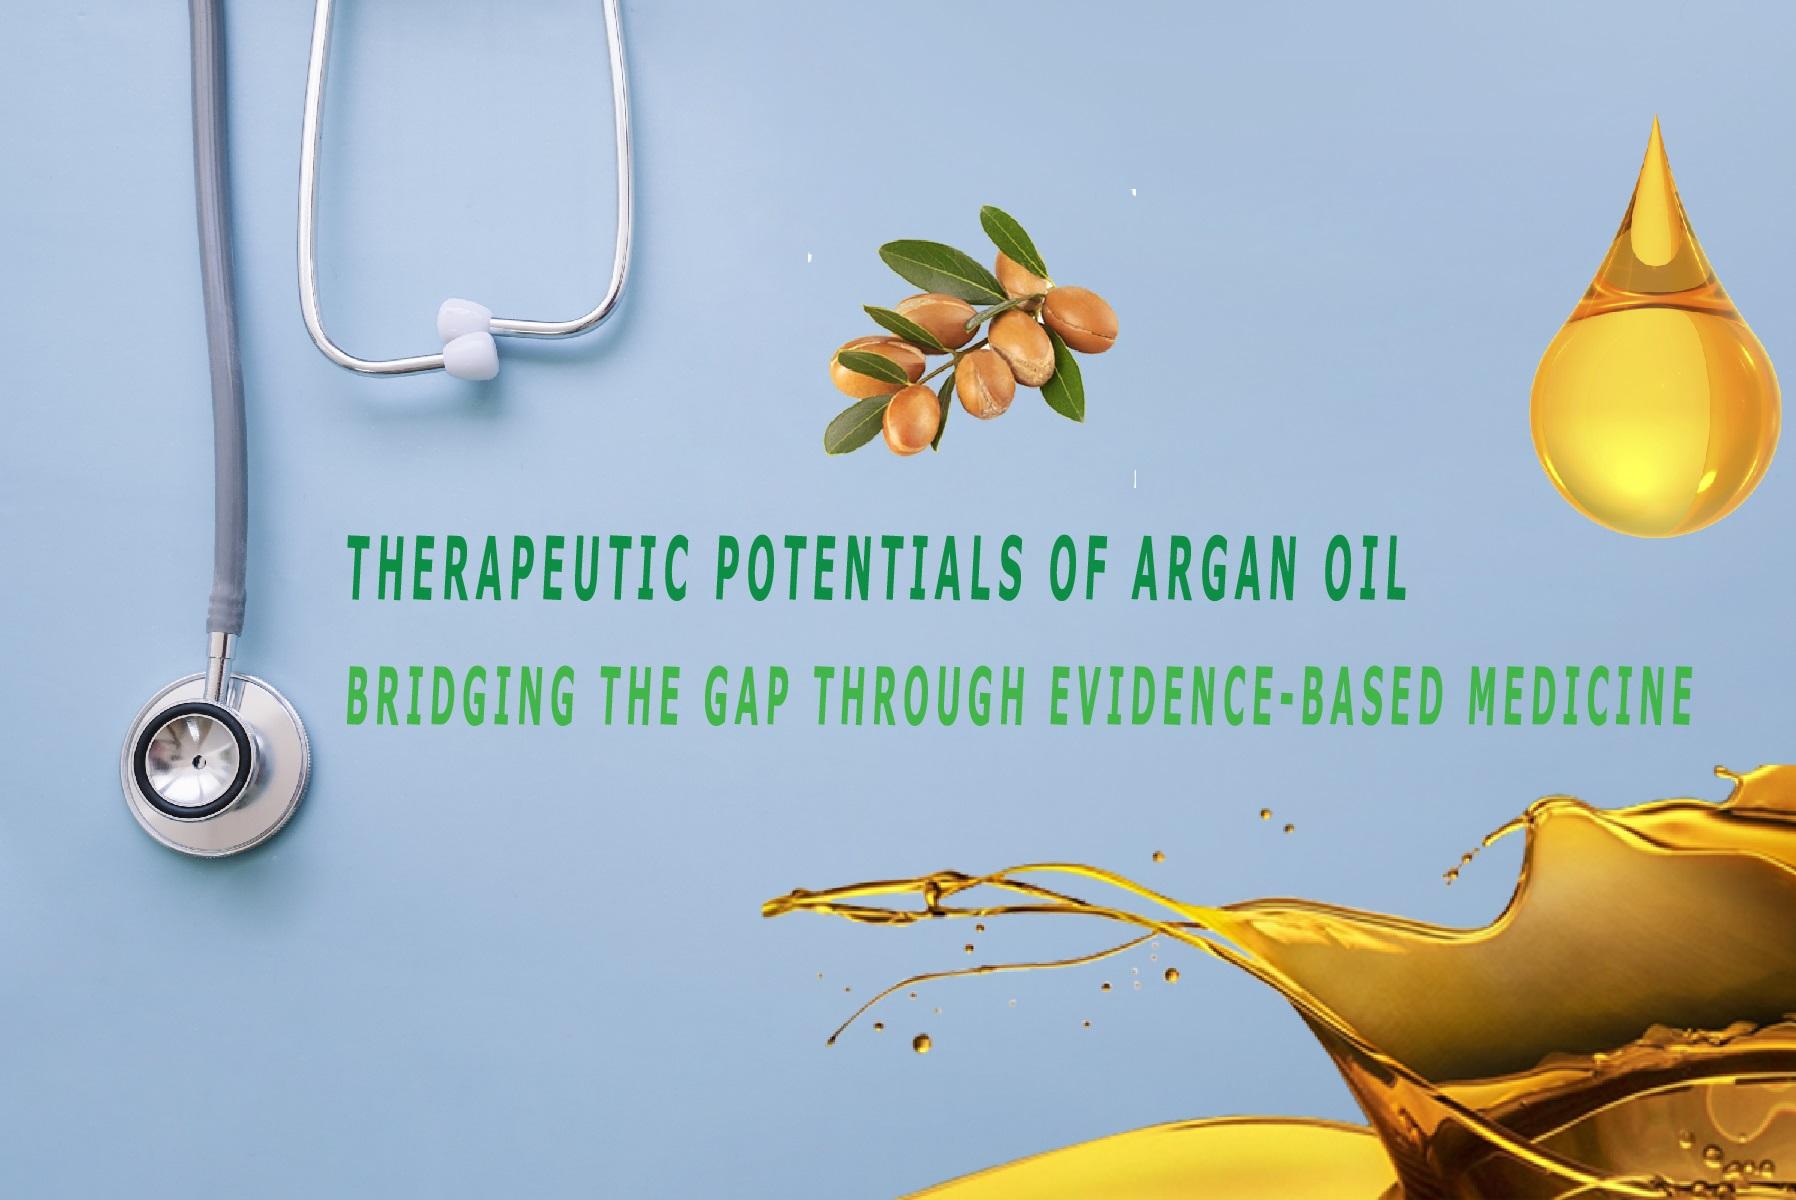 THERAPEUTIC POTENTIALS OF ARGAN OIL: BRIDGING THE GAP THROUGH EVIDENCE-BASED MEDICINE